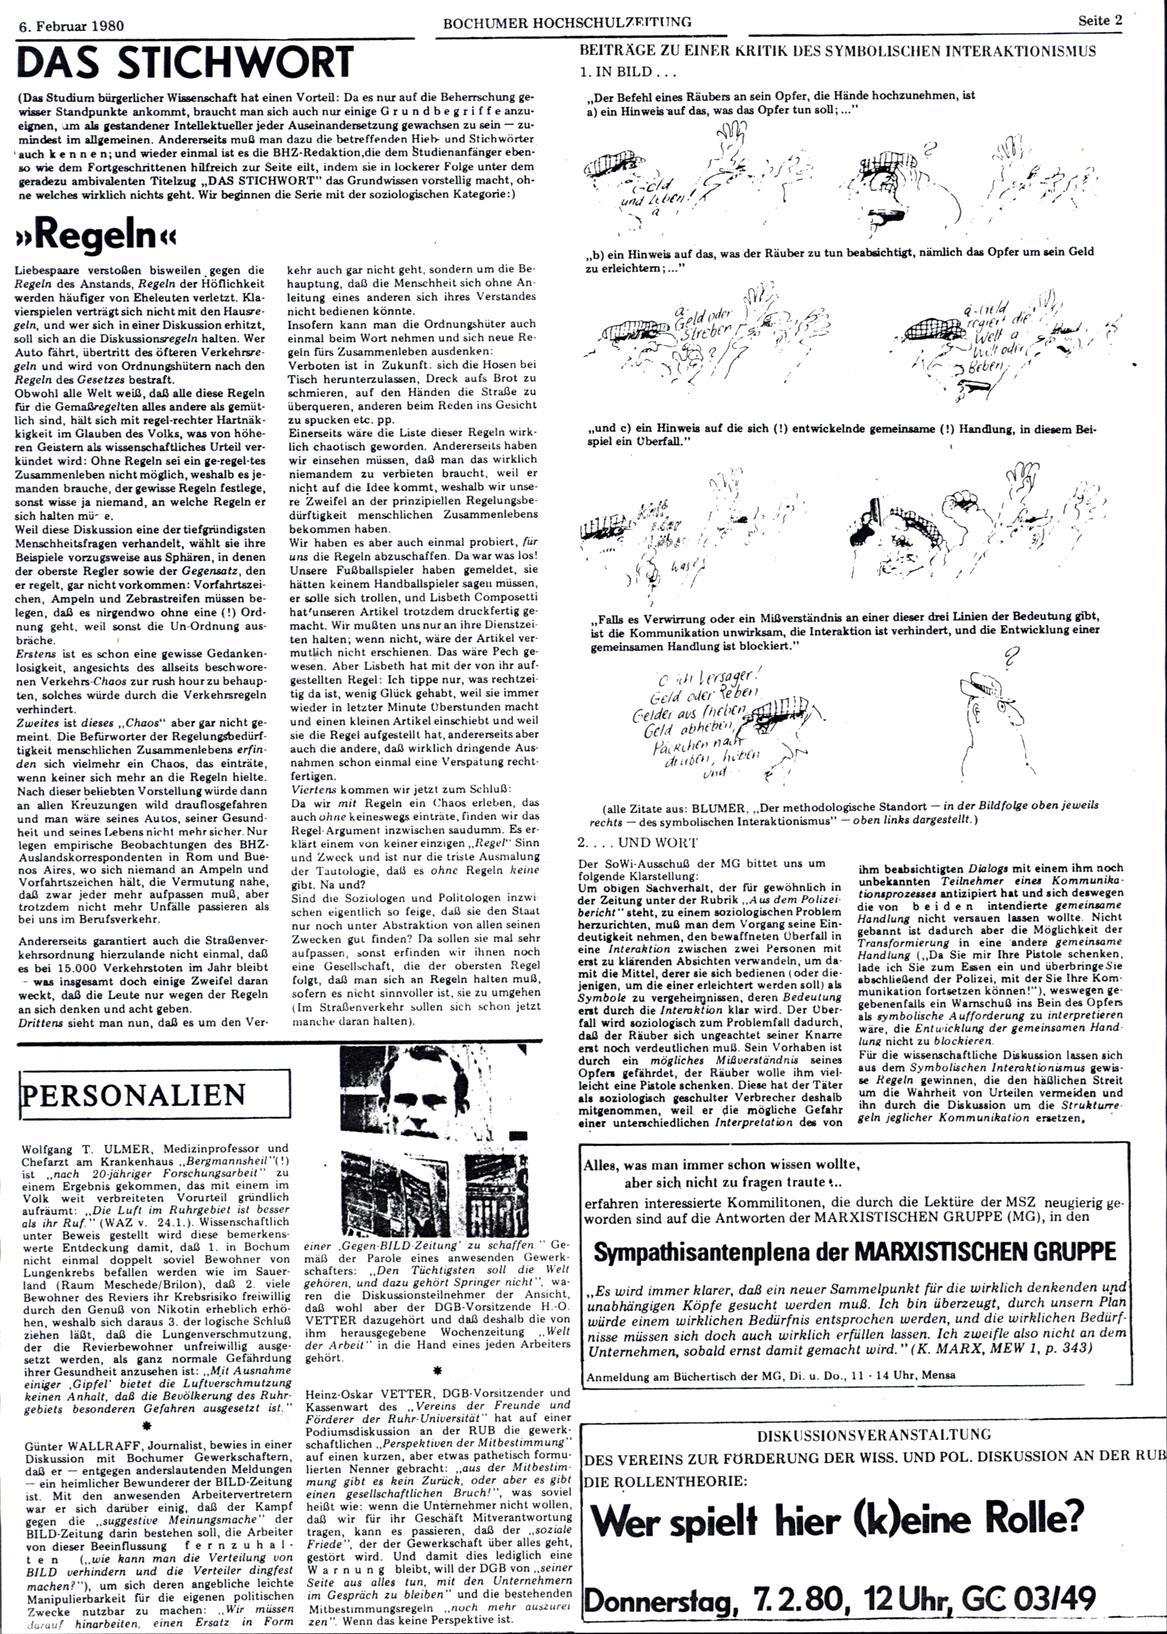 Bochum_BHZ_19800206_007_002